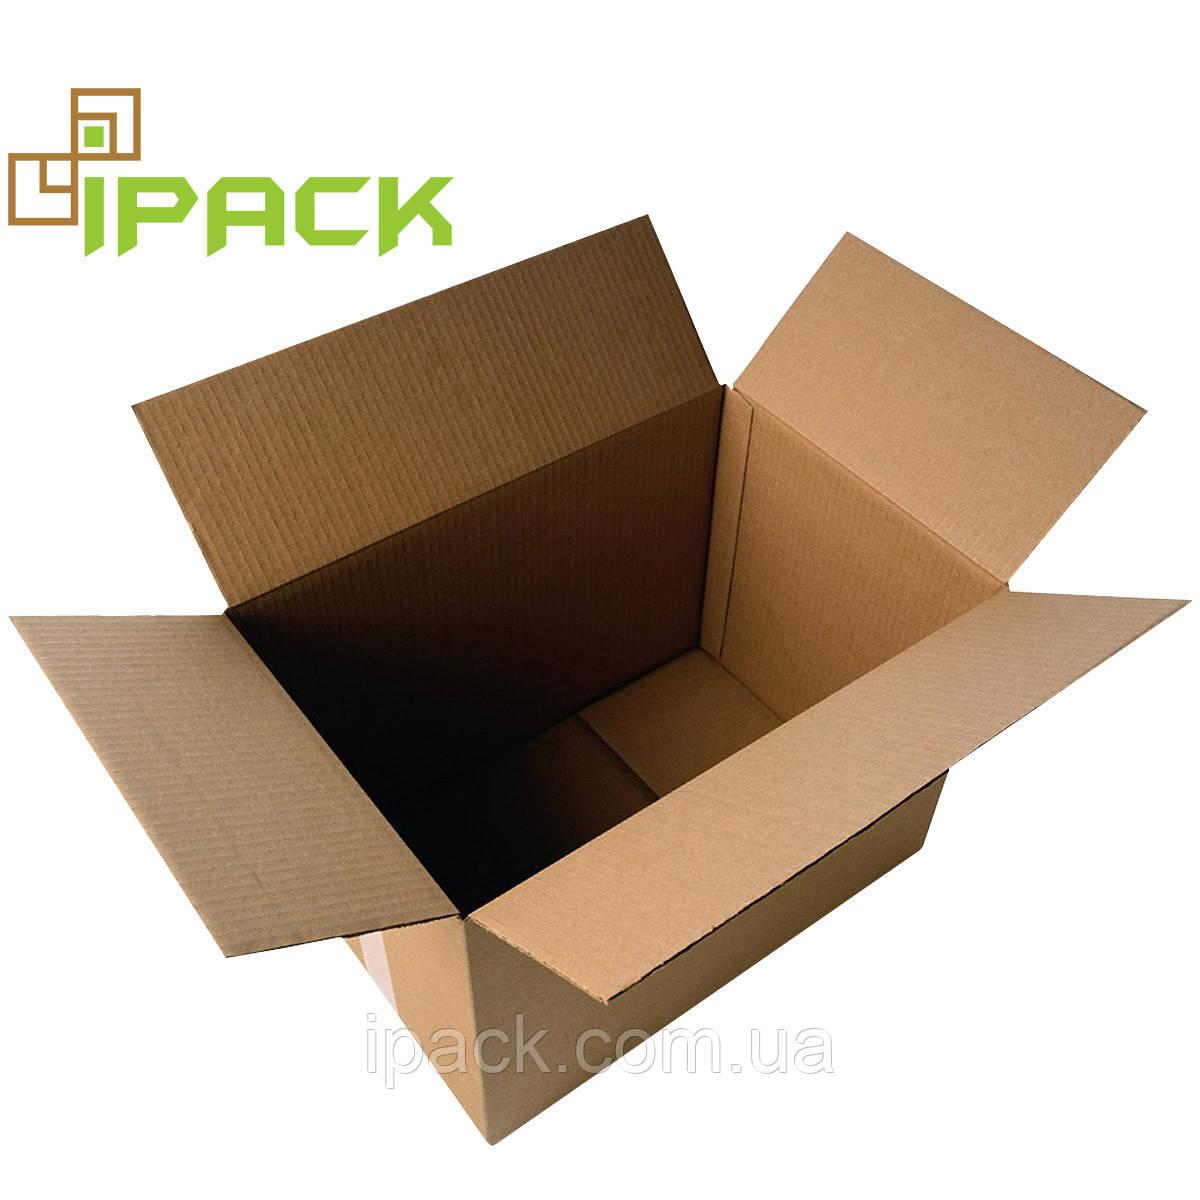 Гофроящик 520*335*265 мм бурий четырехклапанный картонний короб